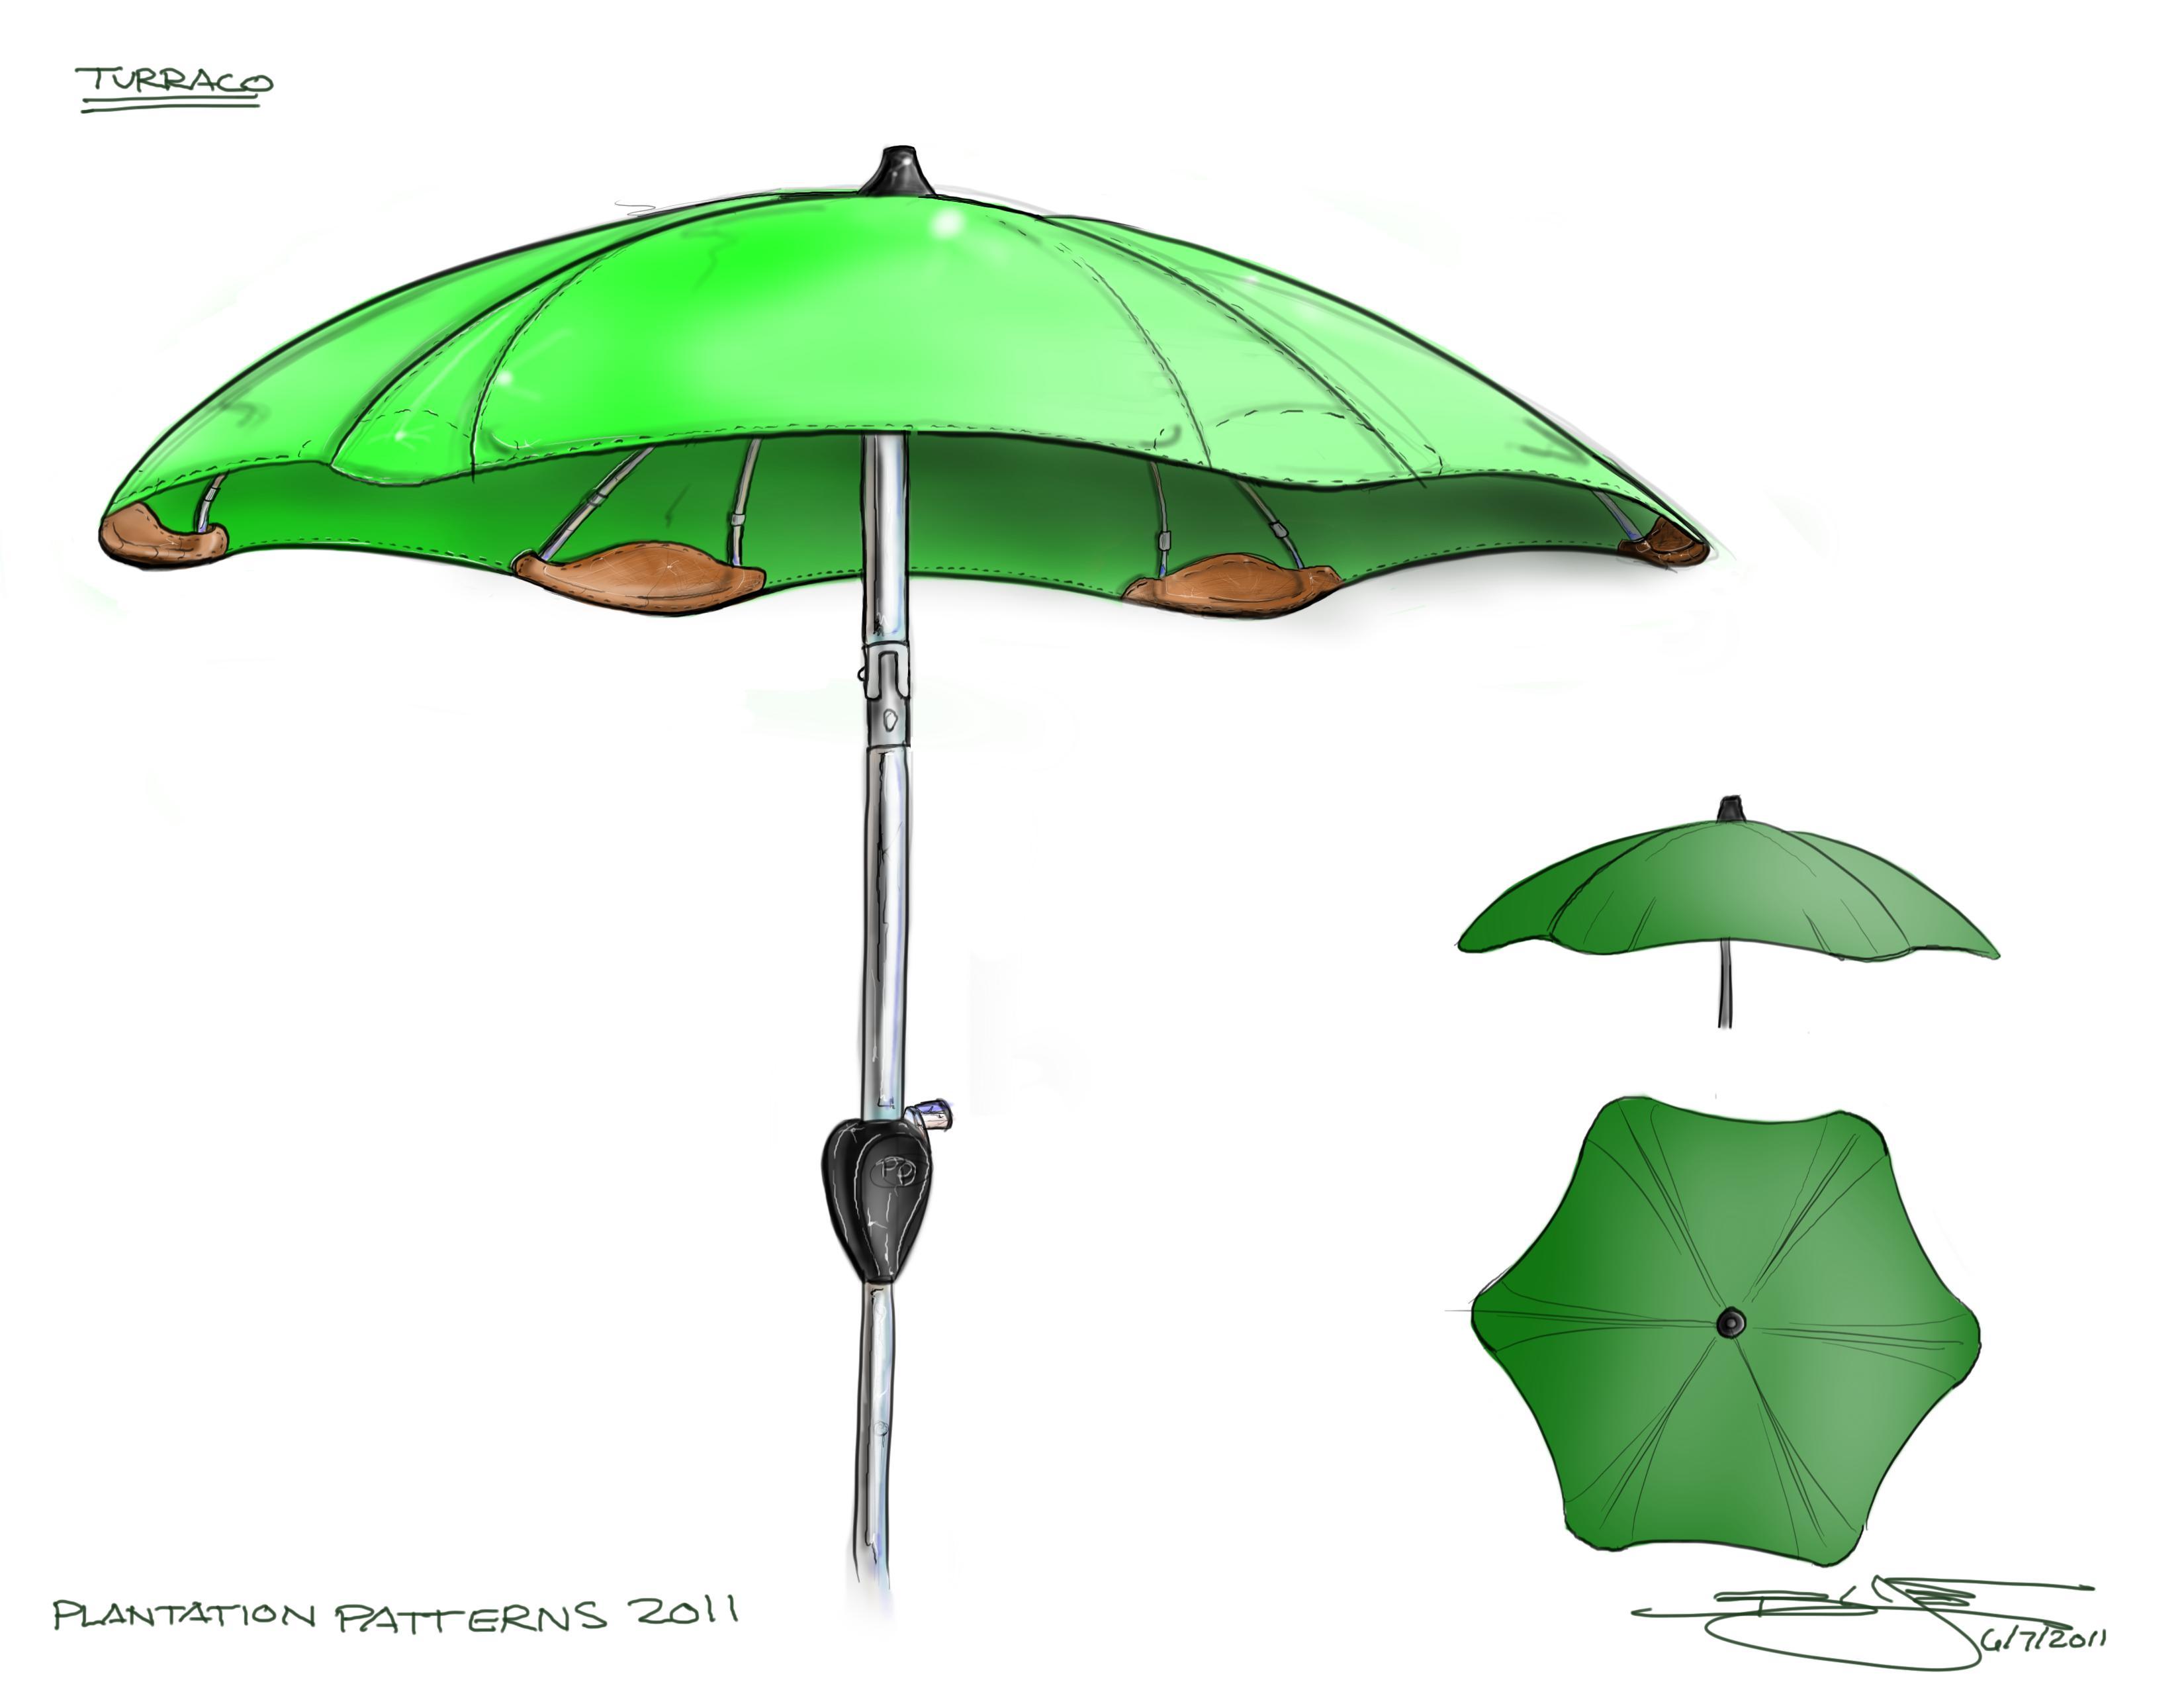 sketchbook pro by brian love at coroflotcom - formed umbrella sketch  sketchbook pro rendering of a modern umbrella